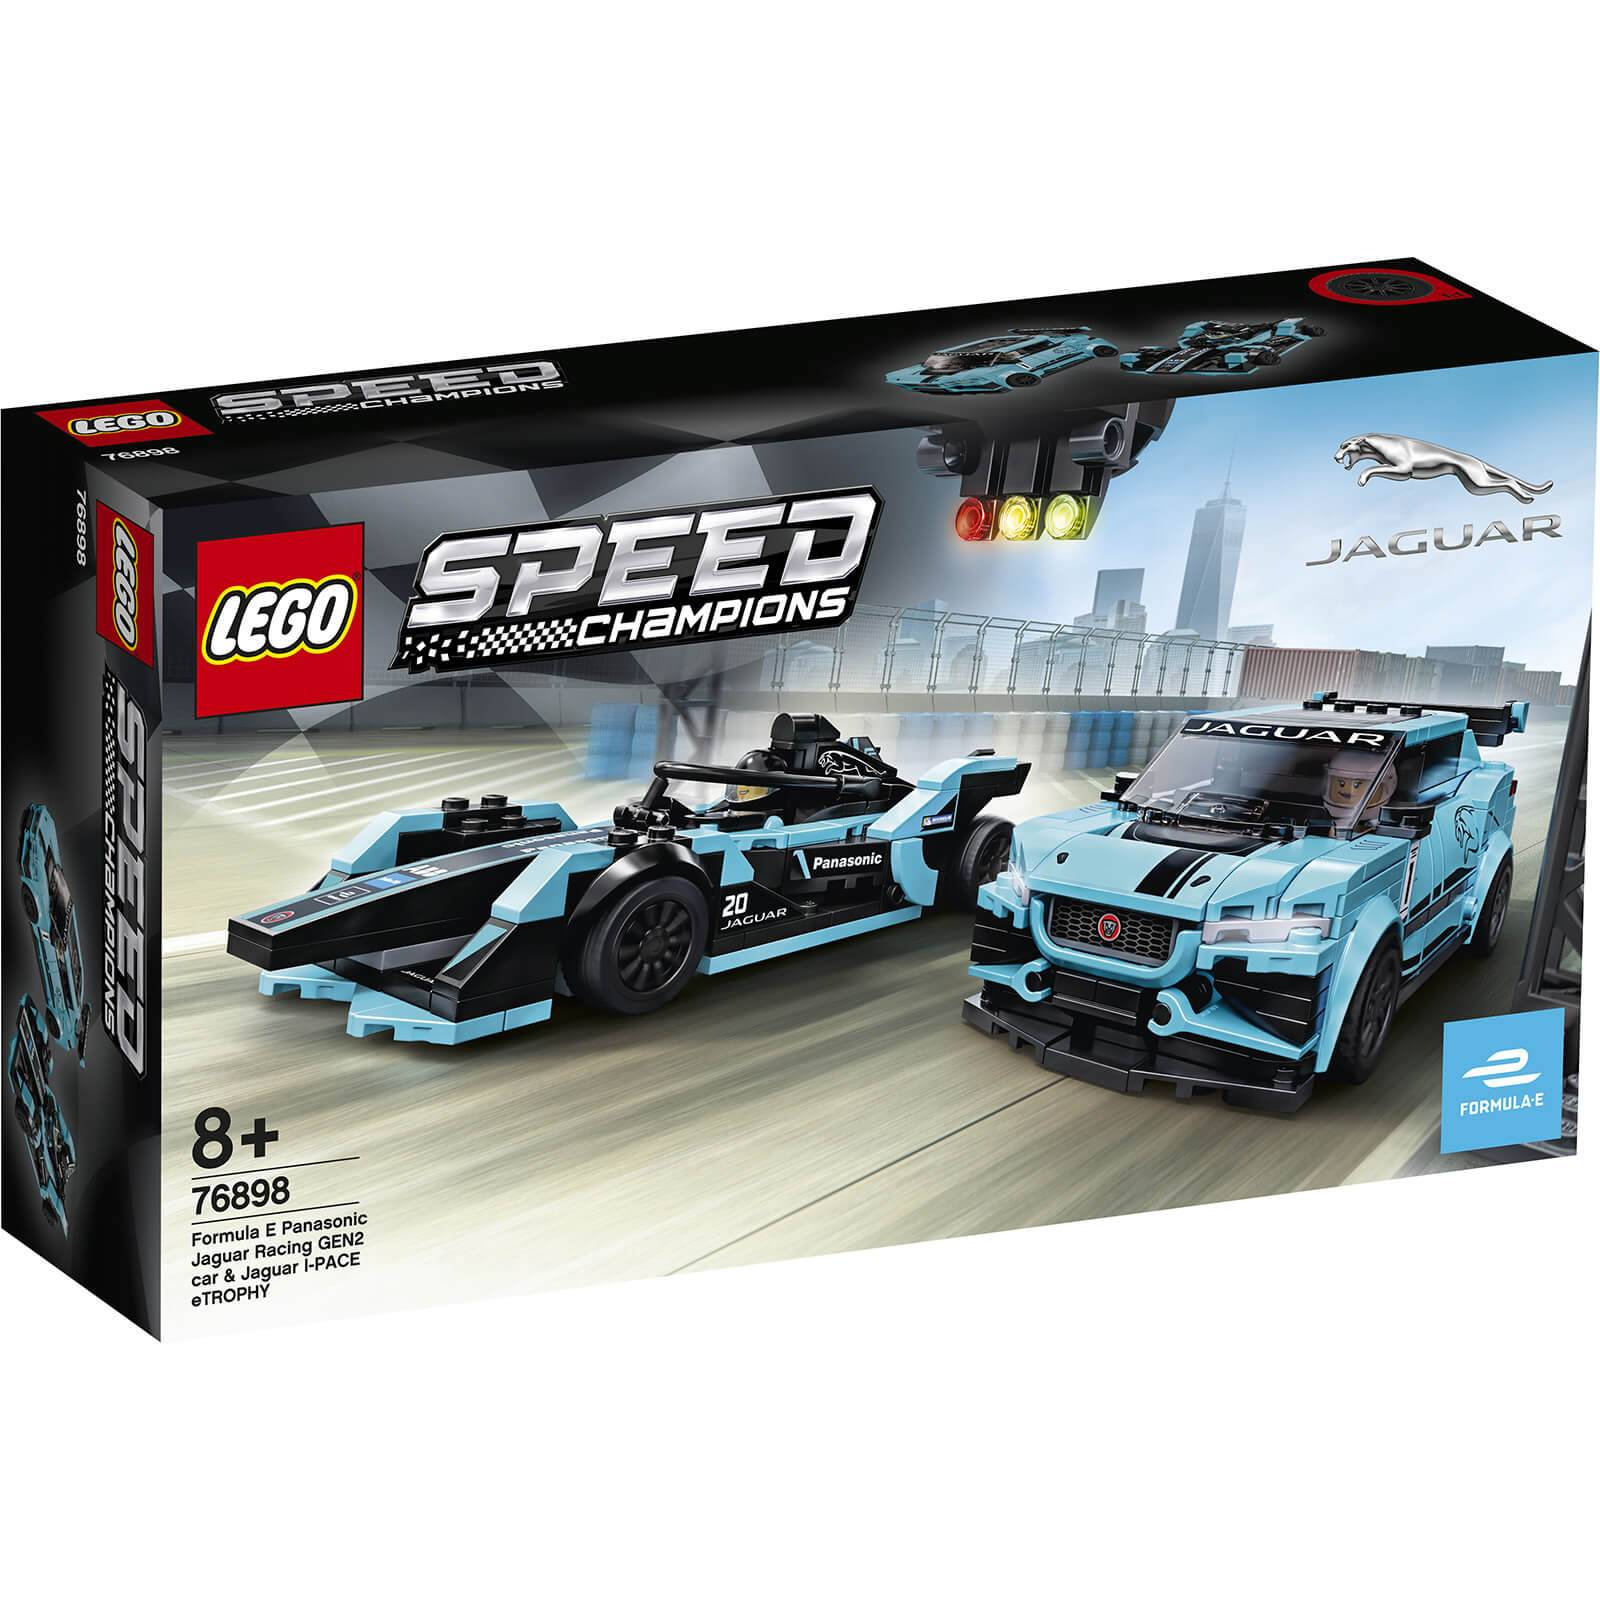 Lego Speed Champions: Formula E Panasonic Jaguar Racing GEN2 c (76898)